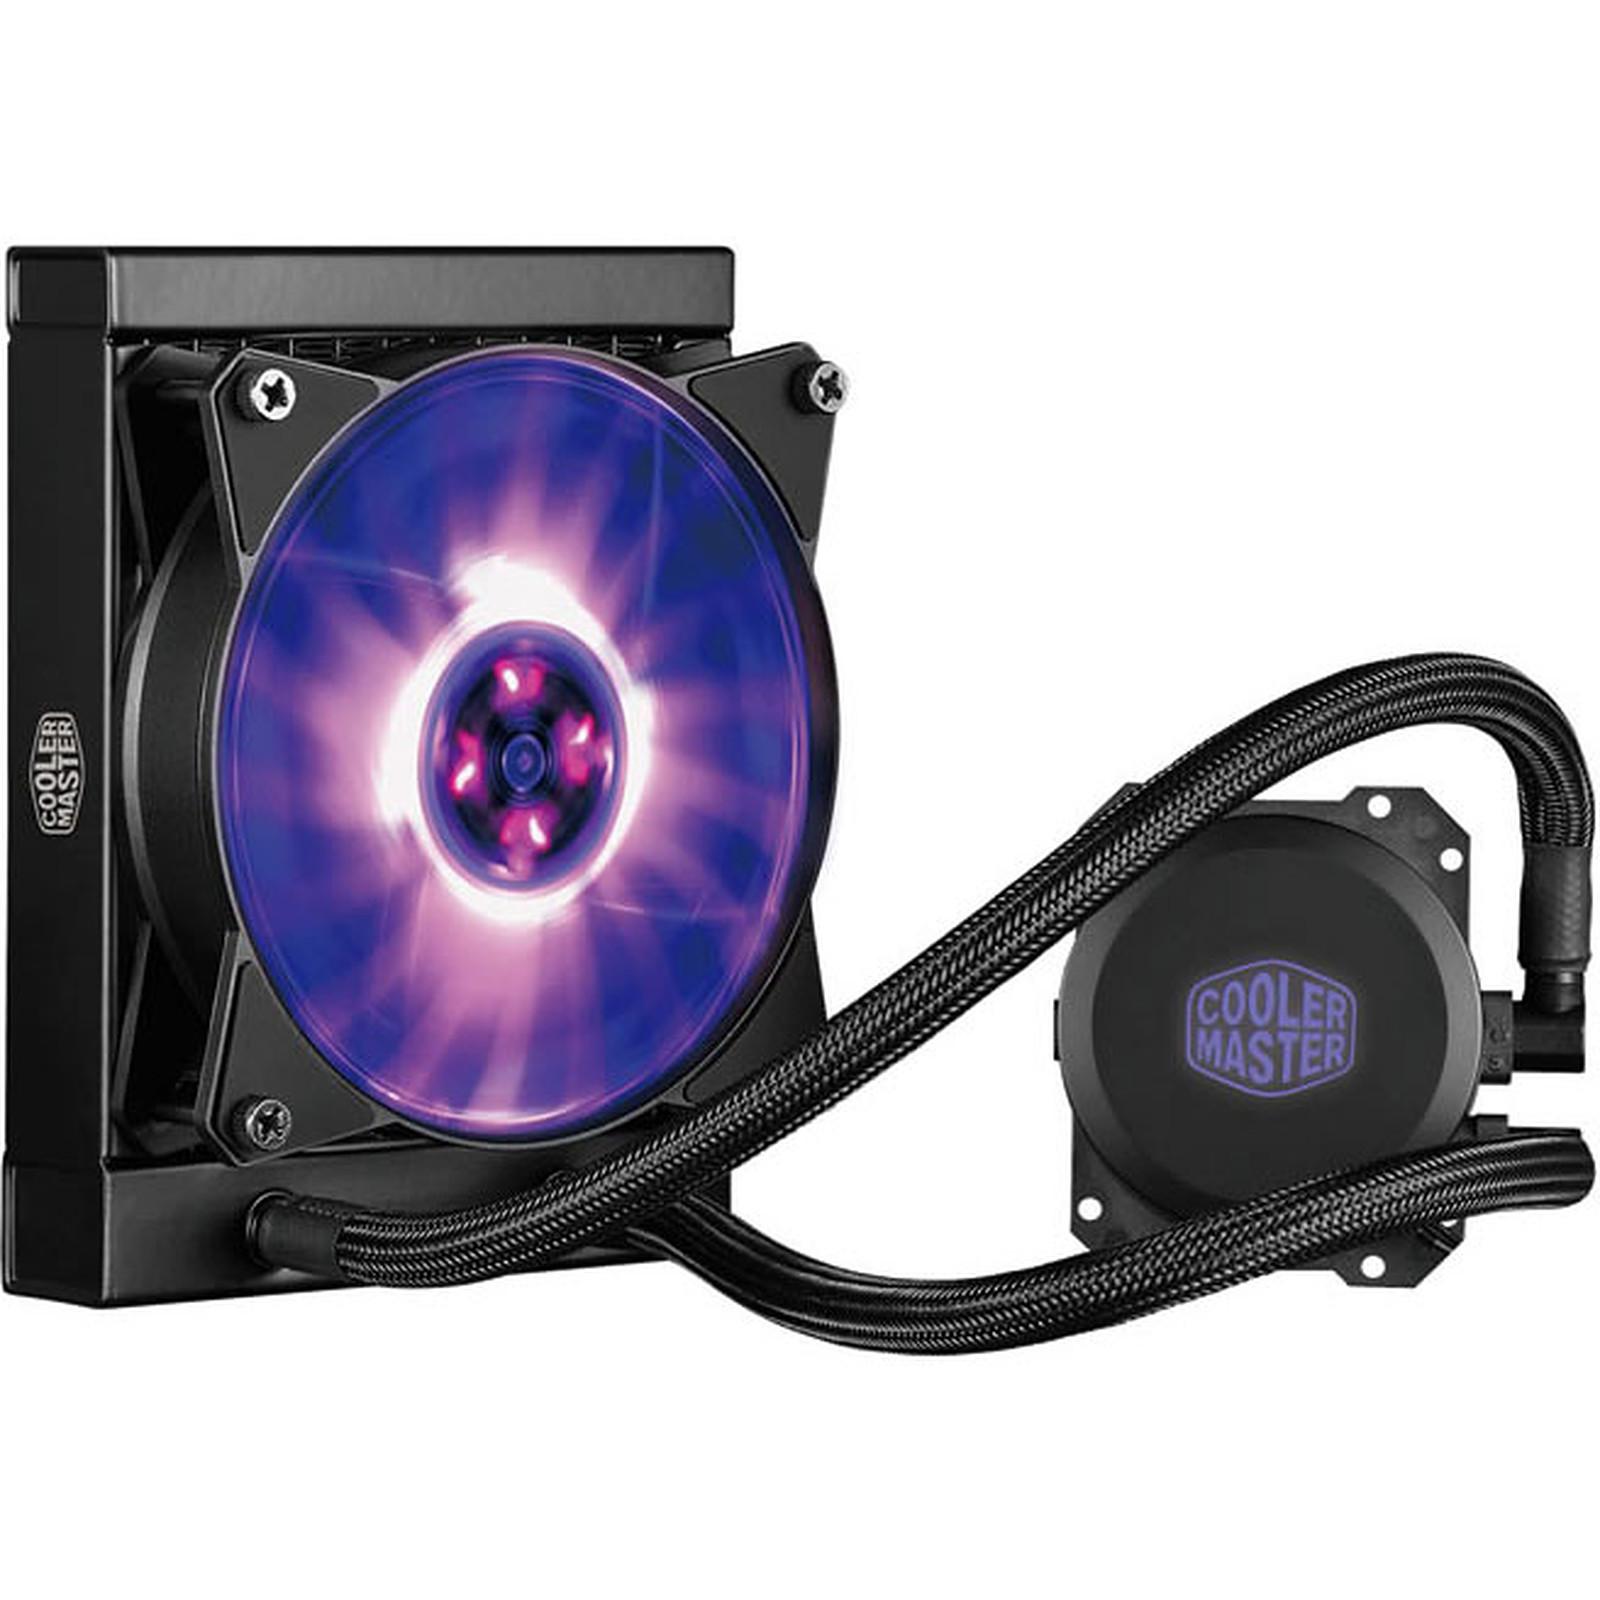 Ventirad Coller Master MasterLiquid ML120L RGB (pour processeurs sockets AMD et Intel), informatique Reunion, 974, Futur Réunion